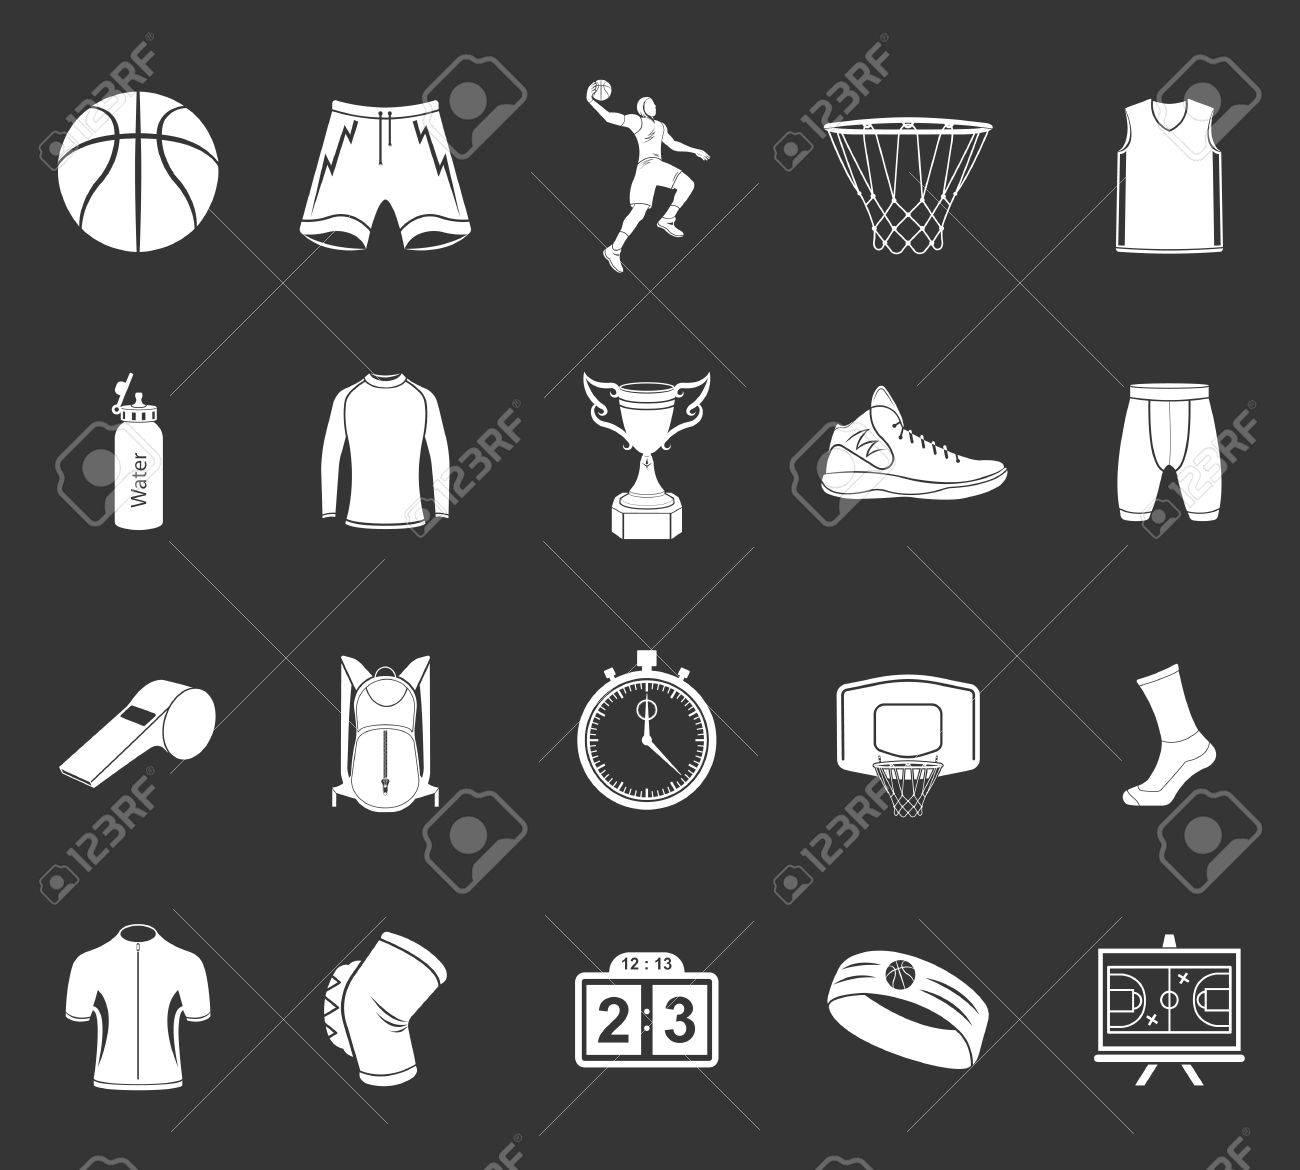 Basketball icon set stock vector large set of symbols logos basketball icon set stock vector large set of symbols logos and icons of buycottarizona